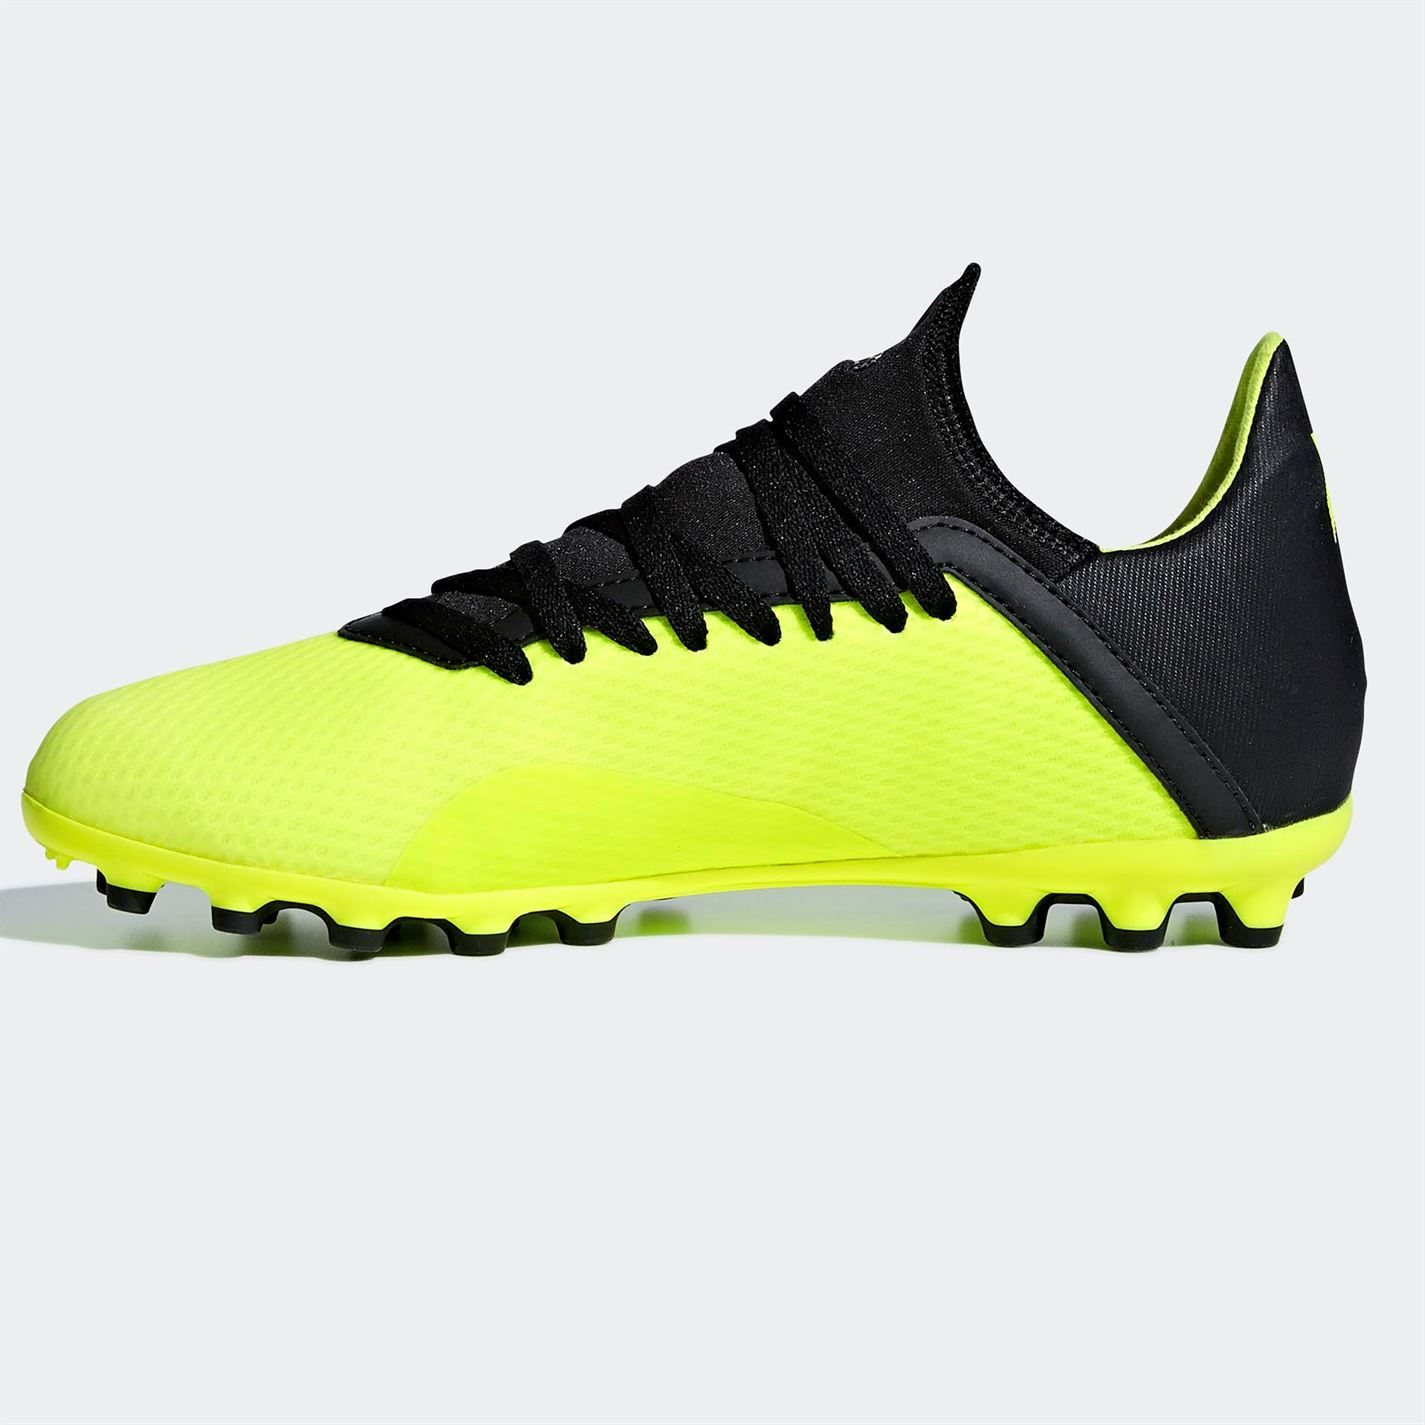 8beee8400eb41 ... Adidas X 1 8.3 Childs AG fútbol botas niños amarillo Soccer zapatos  tacos